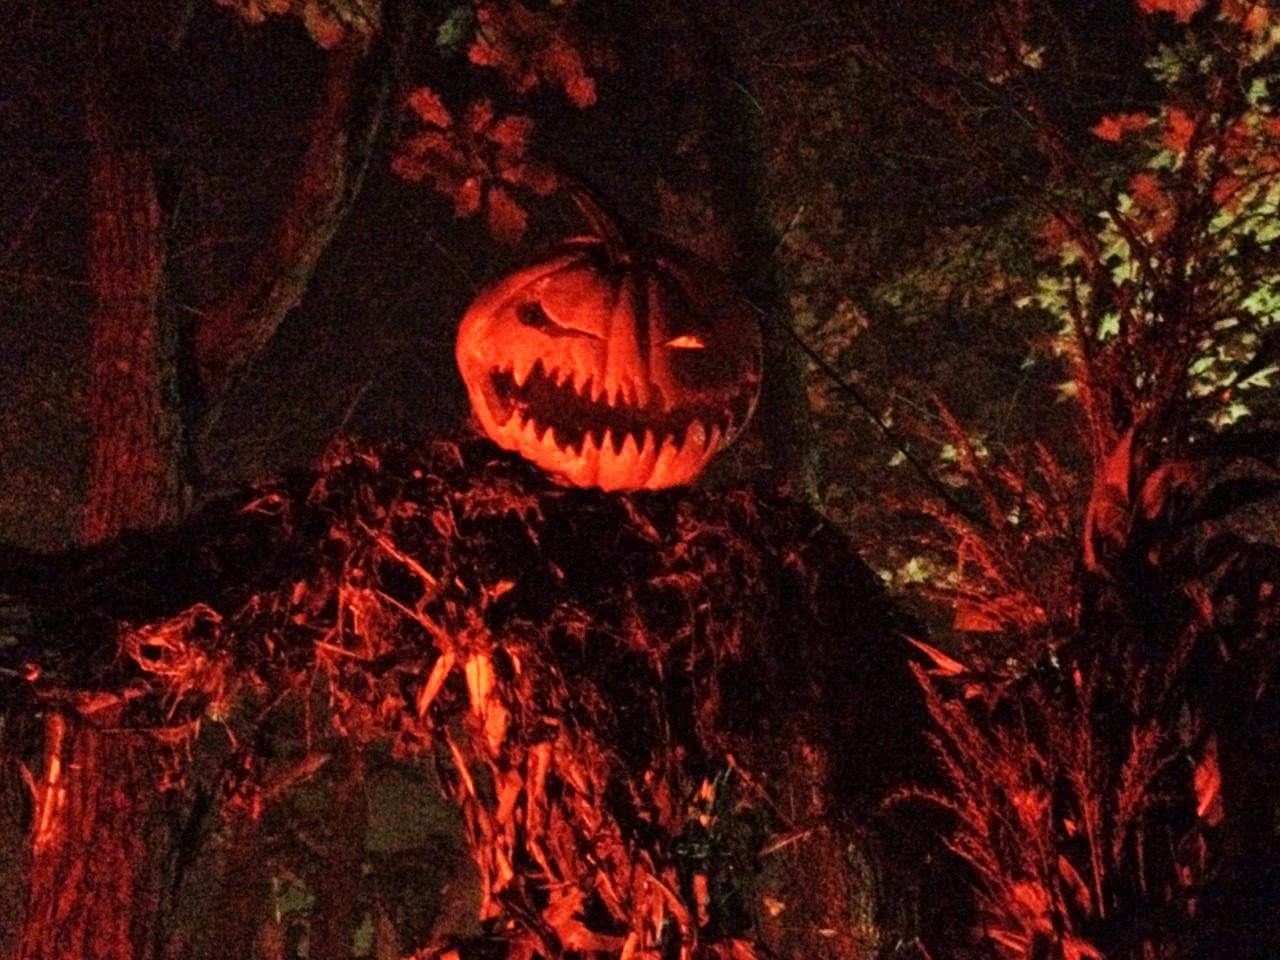 Haunted Overload Pumpkin Head Scarecrow - Halloween New England